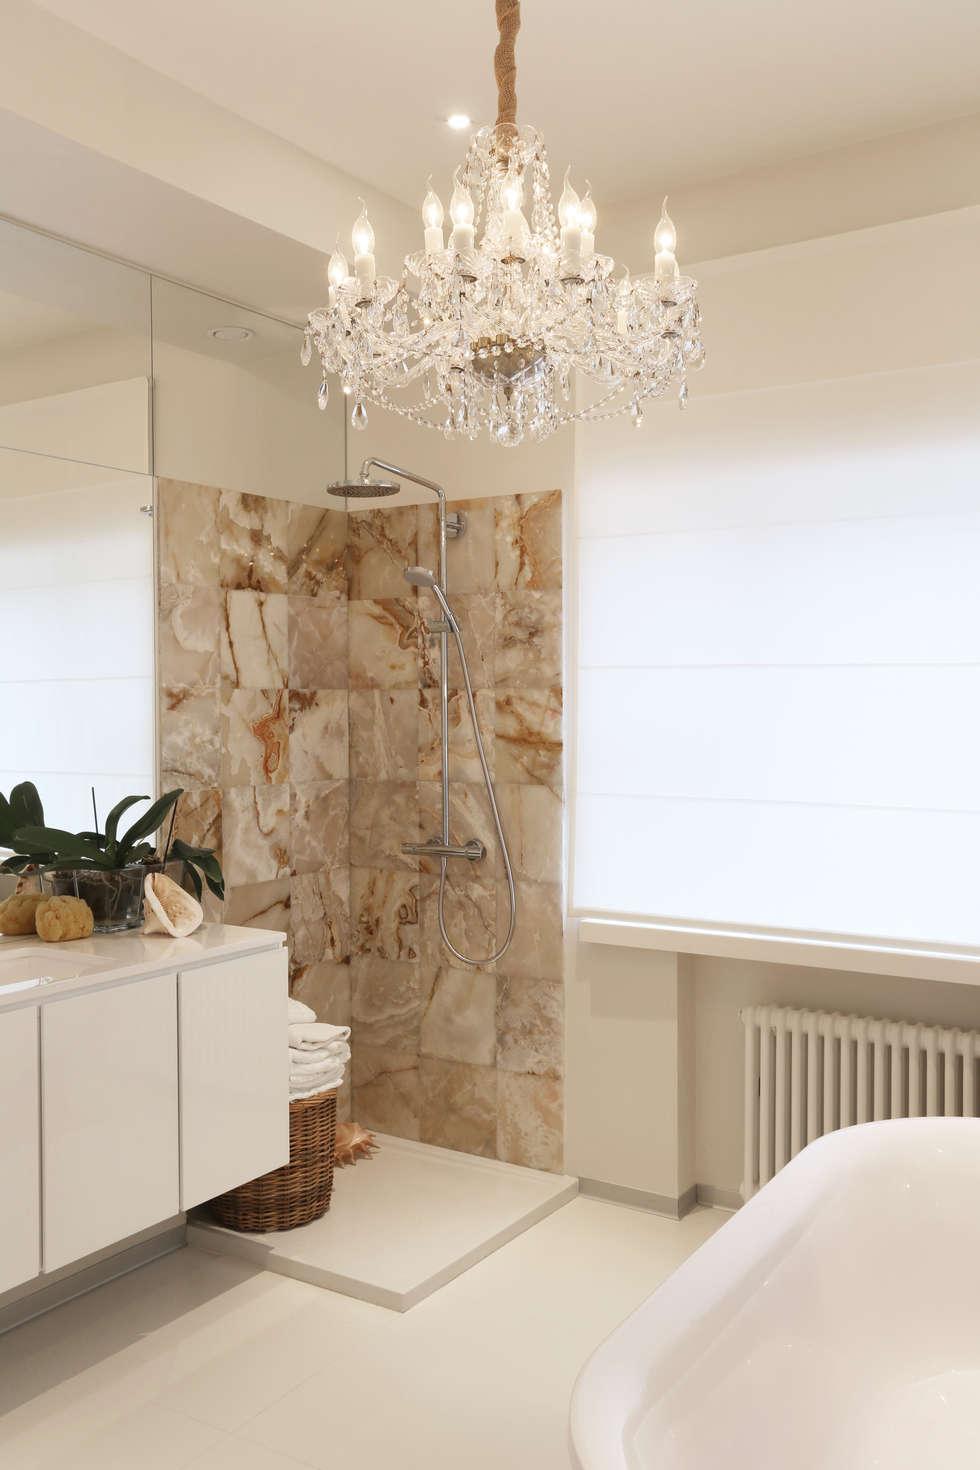 Душ: Ванные комнаты в . Автор – Double Room